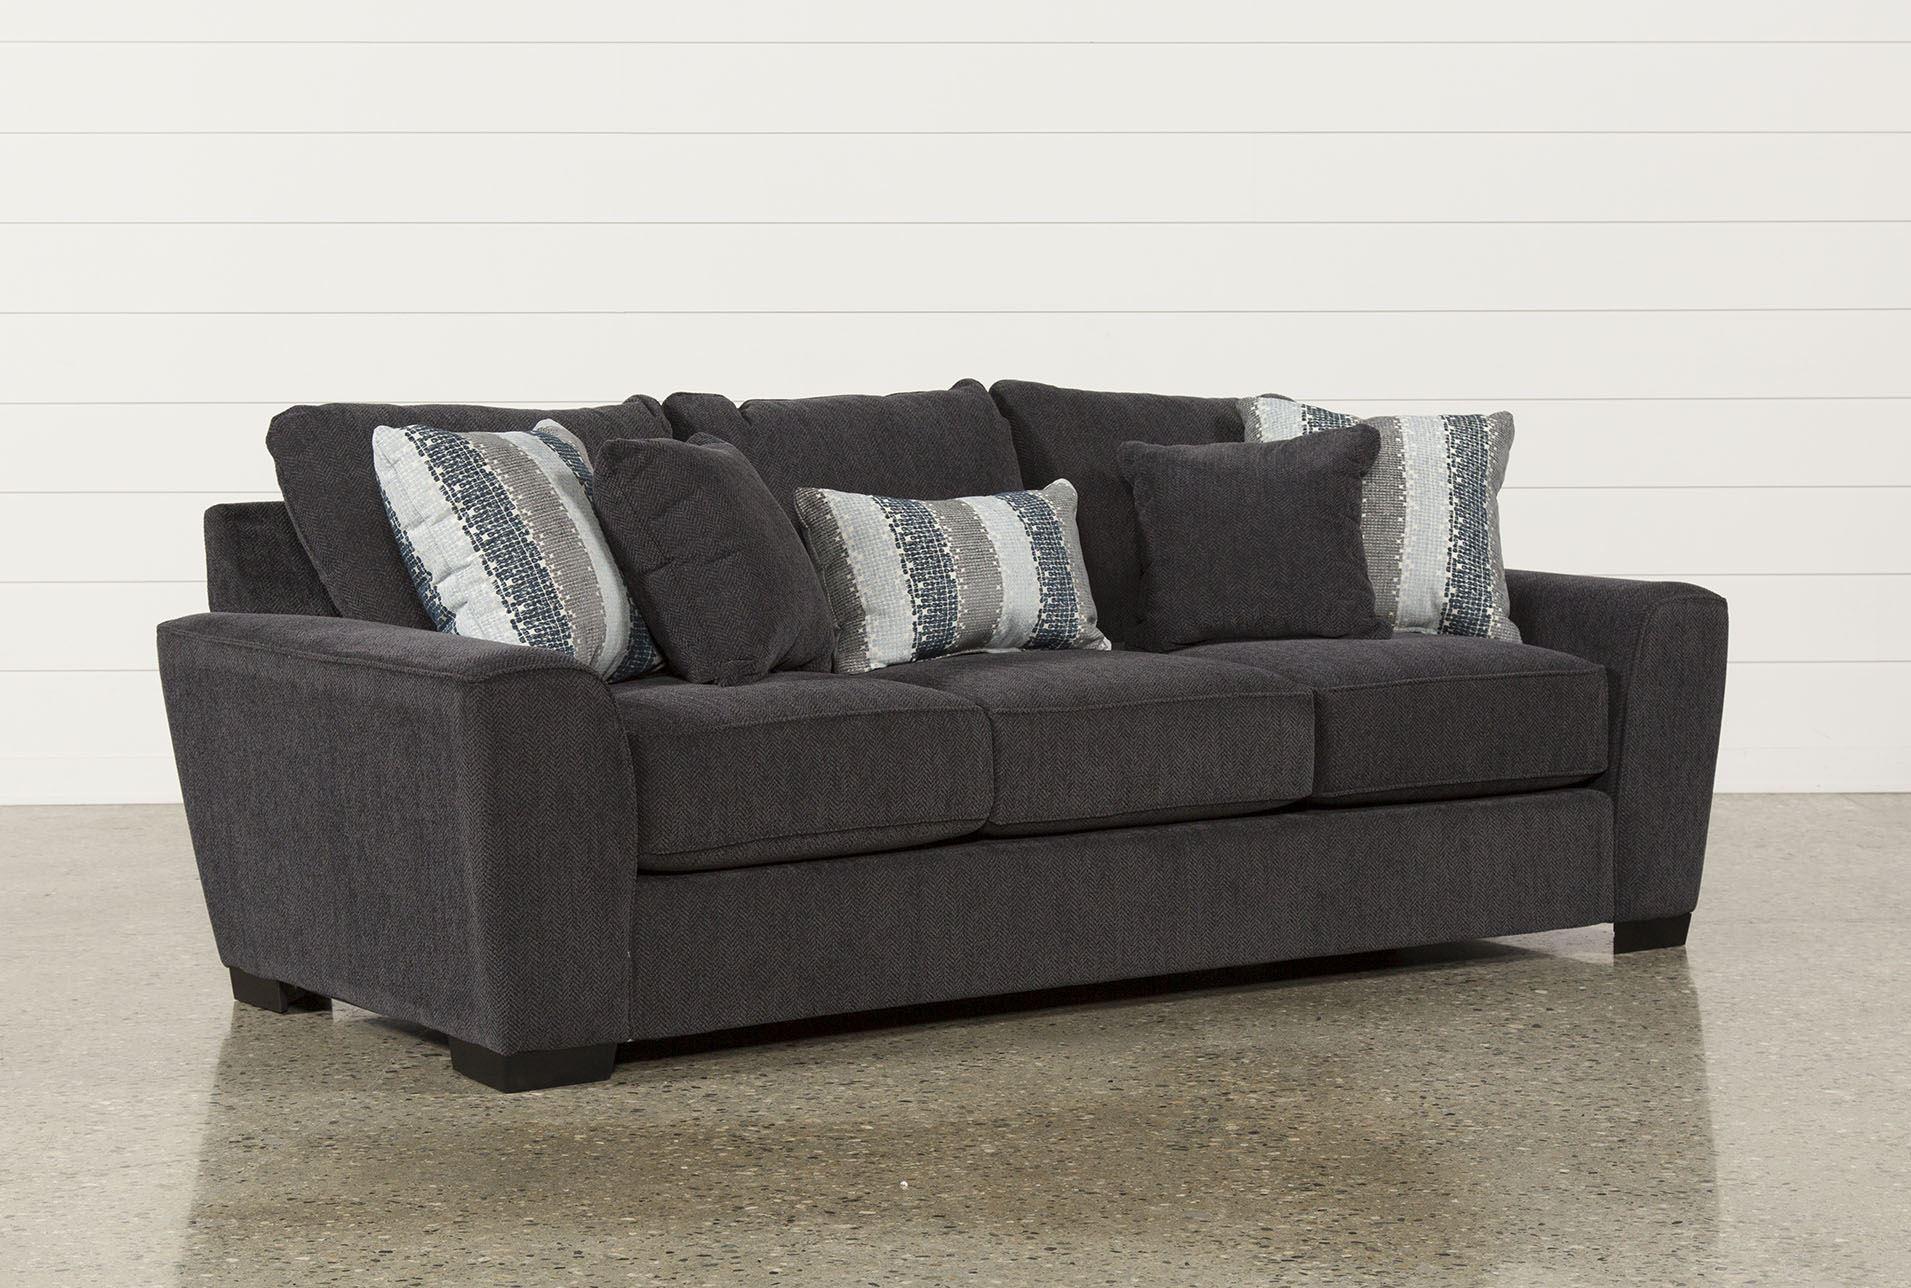 Sofas Center : Amazing Sleeper Sofa Austin Picture Concept Within Austin Sleeper Sofas (Image 10 of 20)